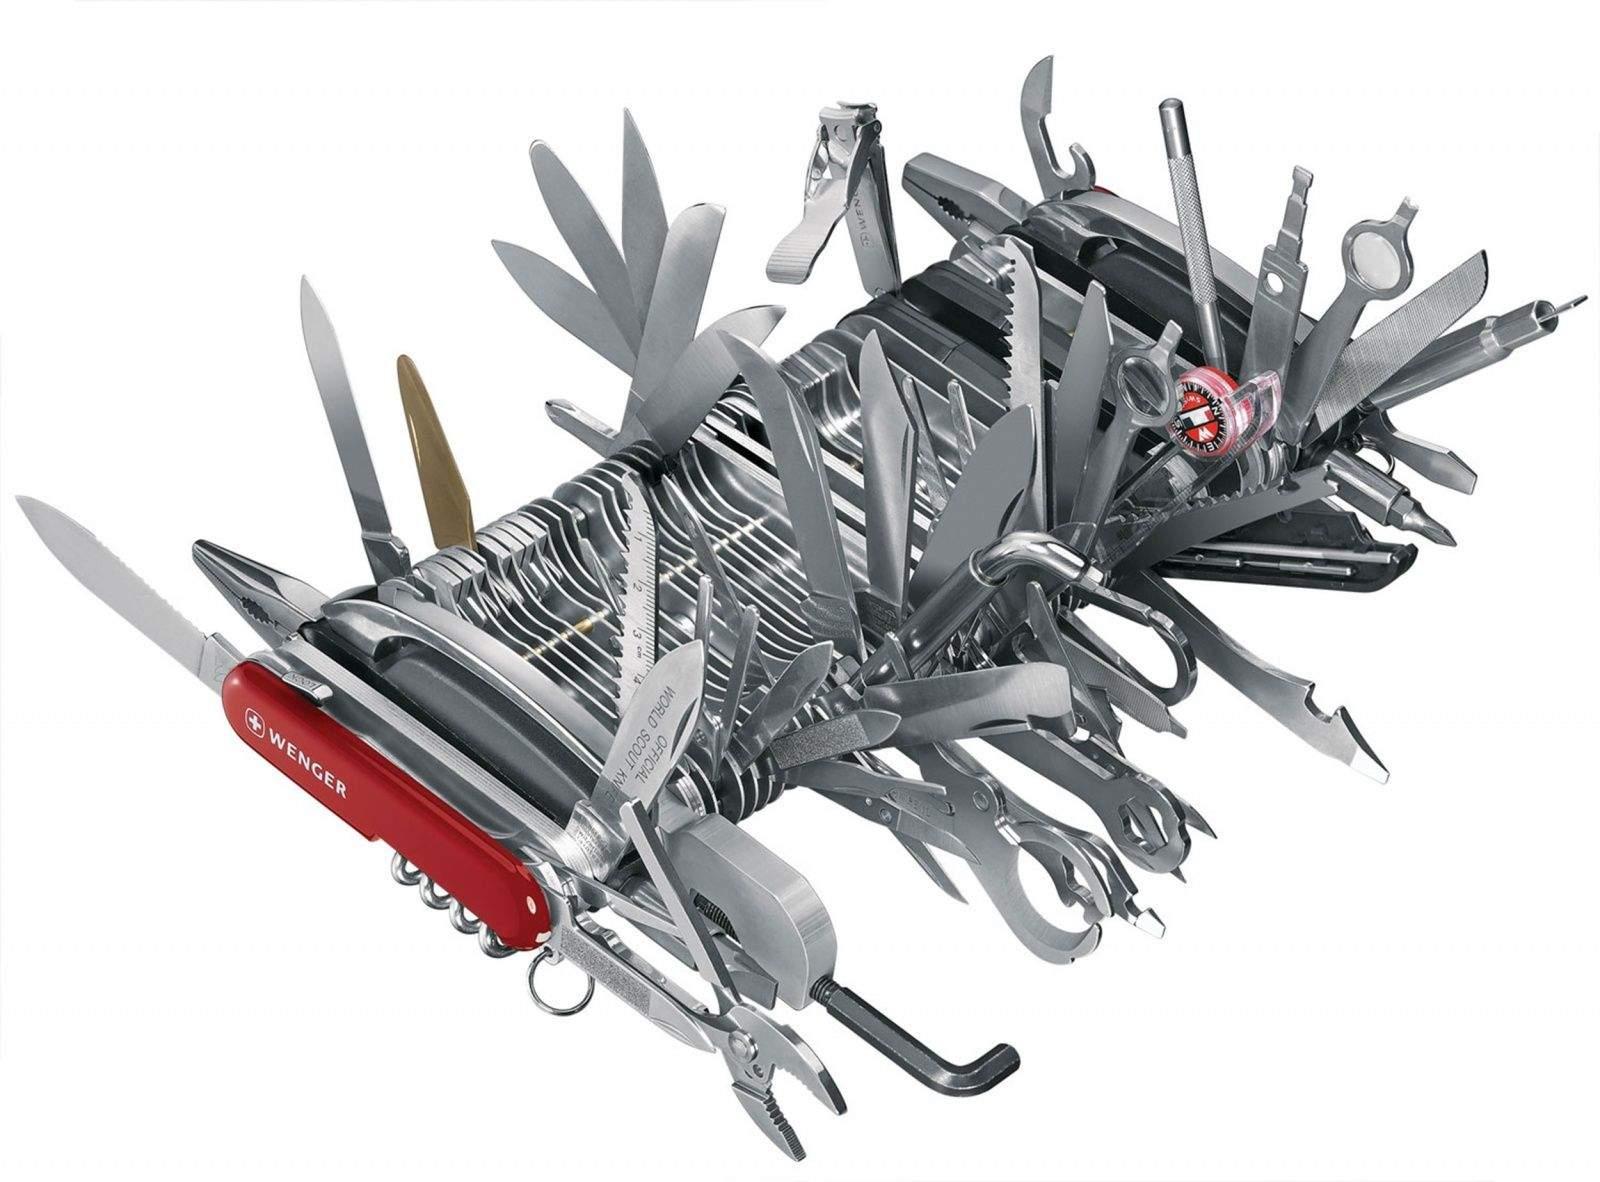 swiss_army_knife007.jpg